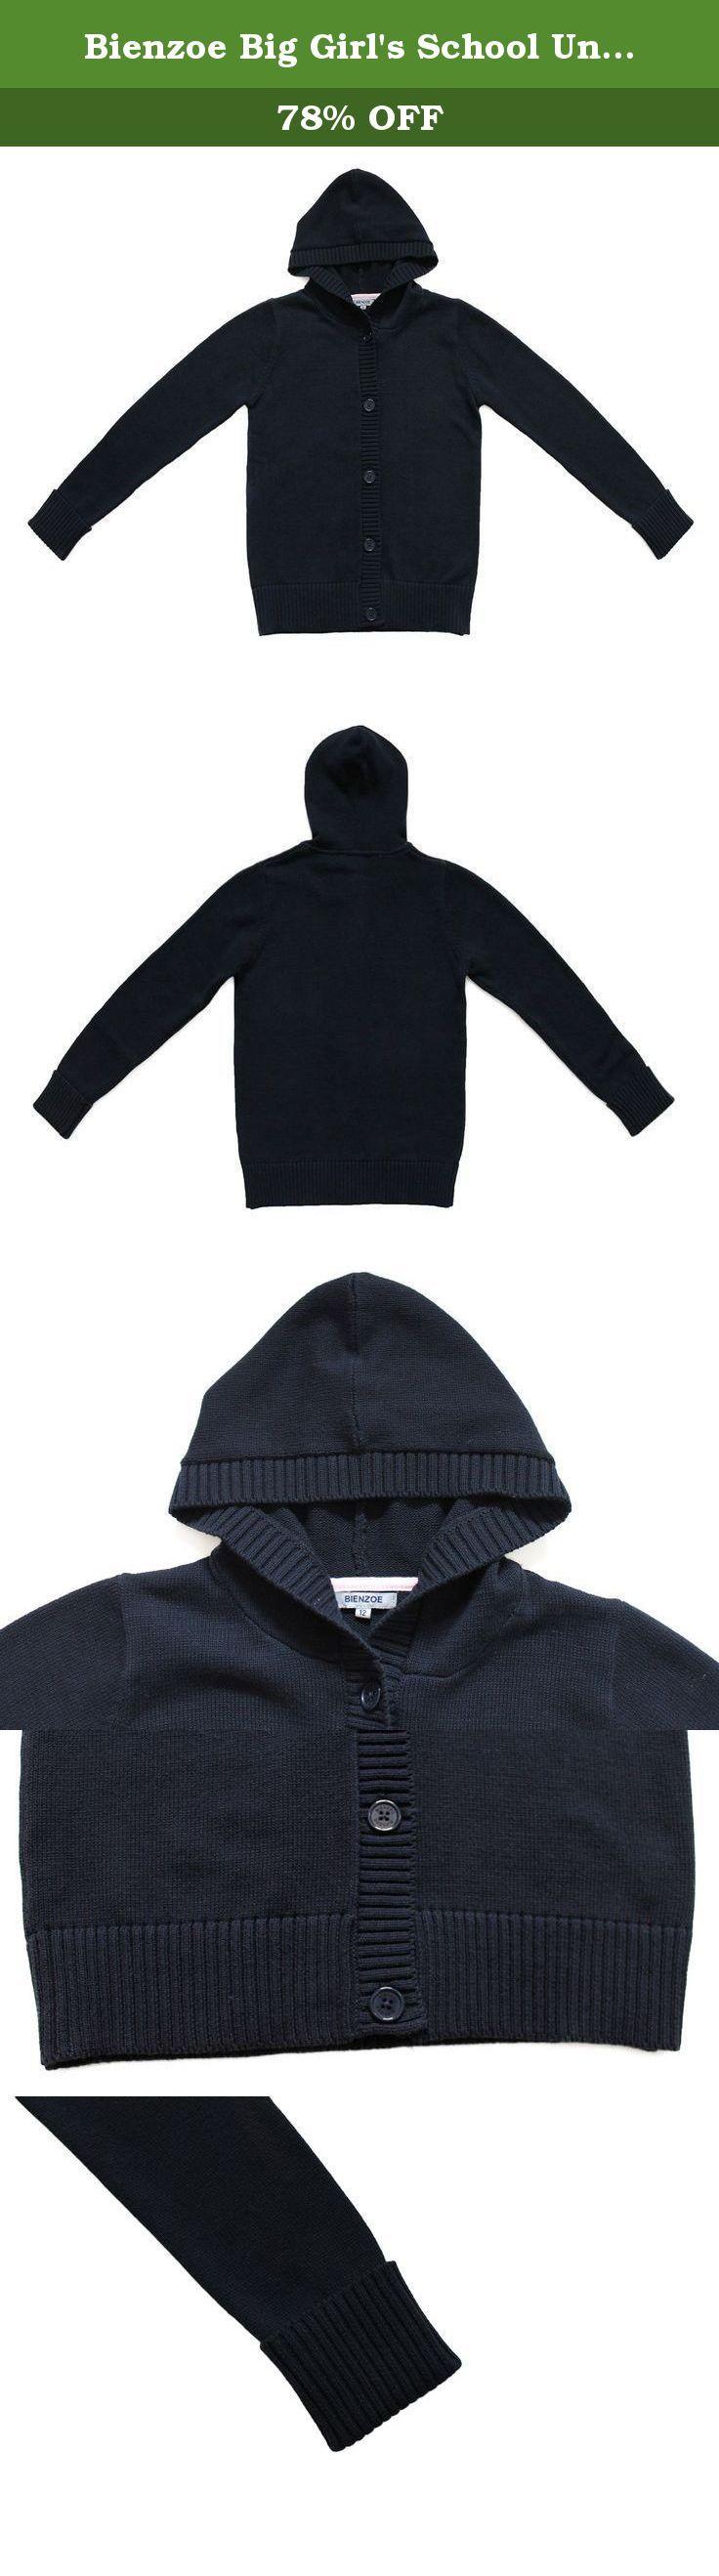 "Bienzoe Big Girl's School Uniforms Antistatic Hooded Cardigan Sweater Navy 16. 1. Bienzoe Size Chart 7--Bust:29.13"", Shoulder:11.4"", Sleeve:20.47"", Body Length:19.88"" 8--Bust:30.7"", Shoulder:11.8"", Sleeve:20.86"", Body Length:20.66"" 10--Bust:32.3"", Shoulder:12.2"", Sleeve:21.25"", Body Length:21.45"" 12--Bust:33.85"", Shoulder:12.6"", Sleeve:21.65"", Body Length:22.24"" 14--Bust:35.43"", Shoulder:13"", Sleeve:22.04"", Body Length:23.03"" 2. Service Guarantee * If you received an incorrect, damaged..."